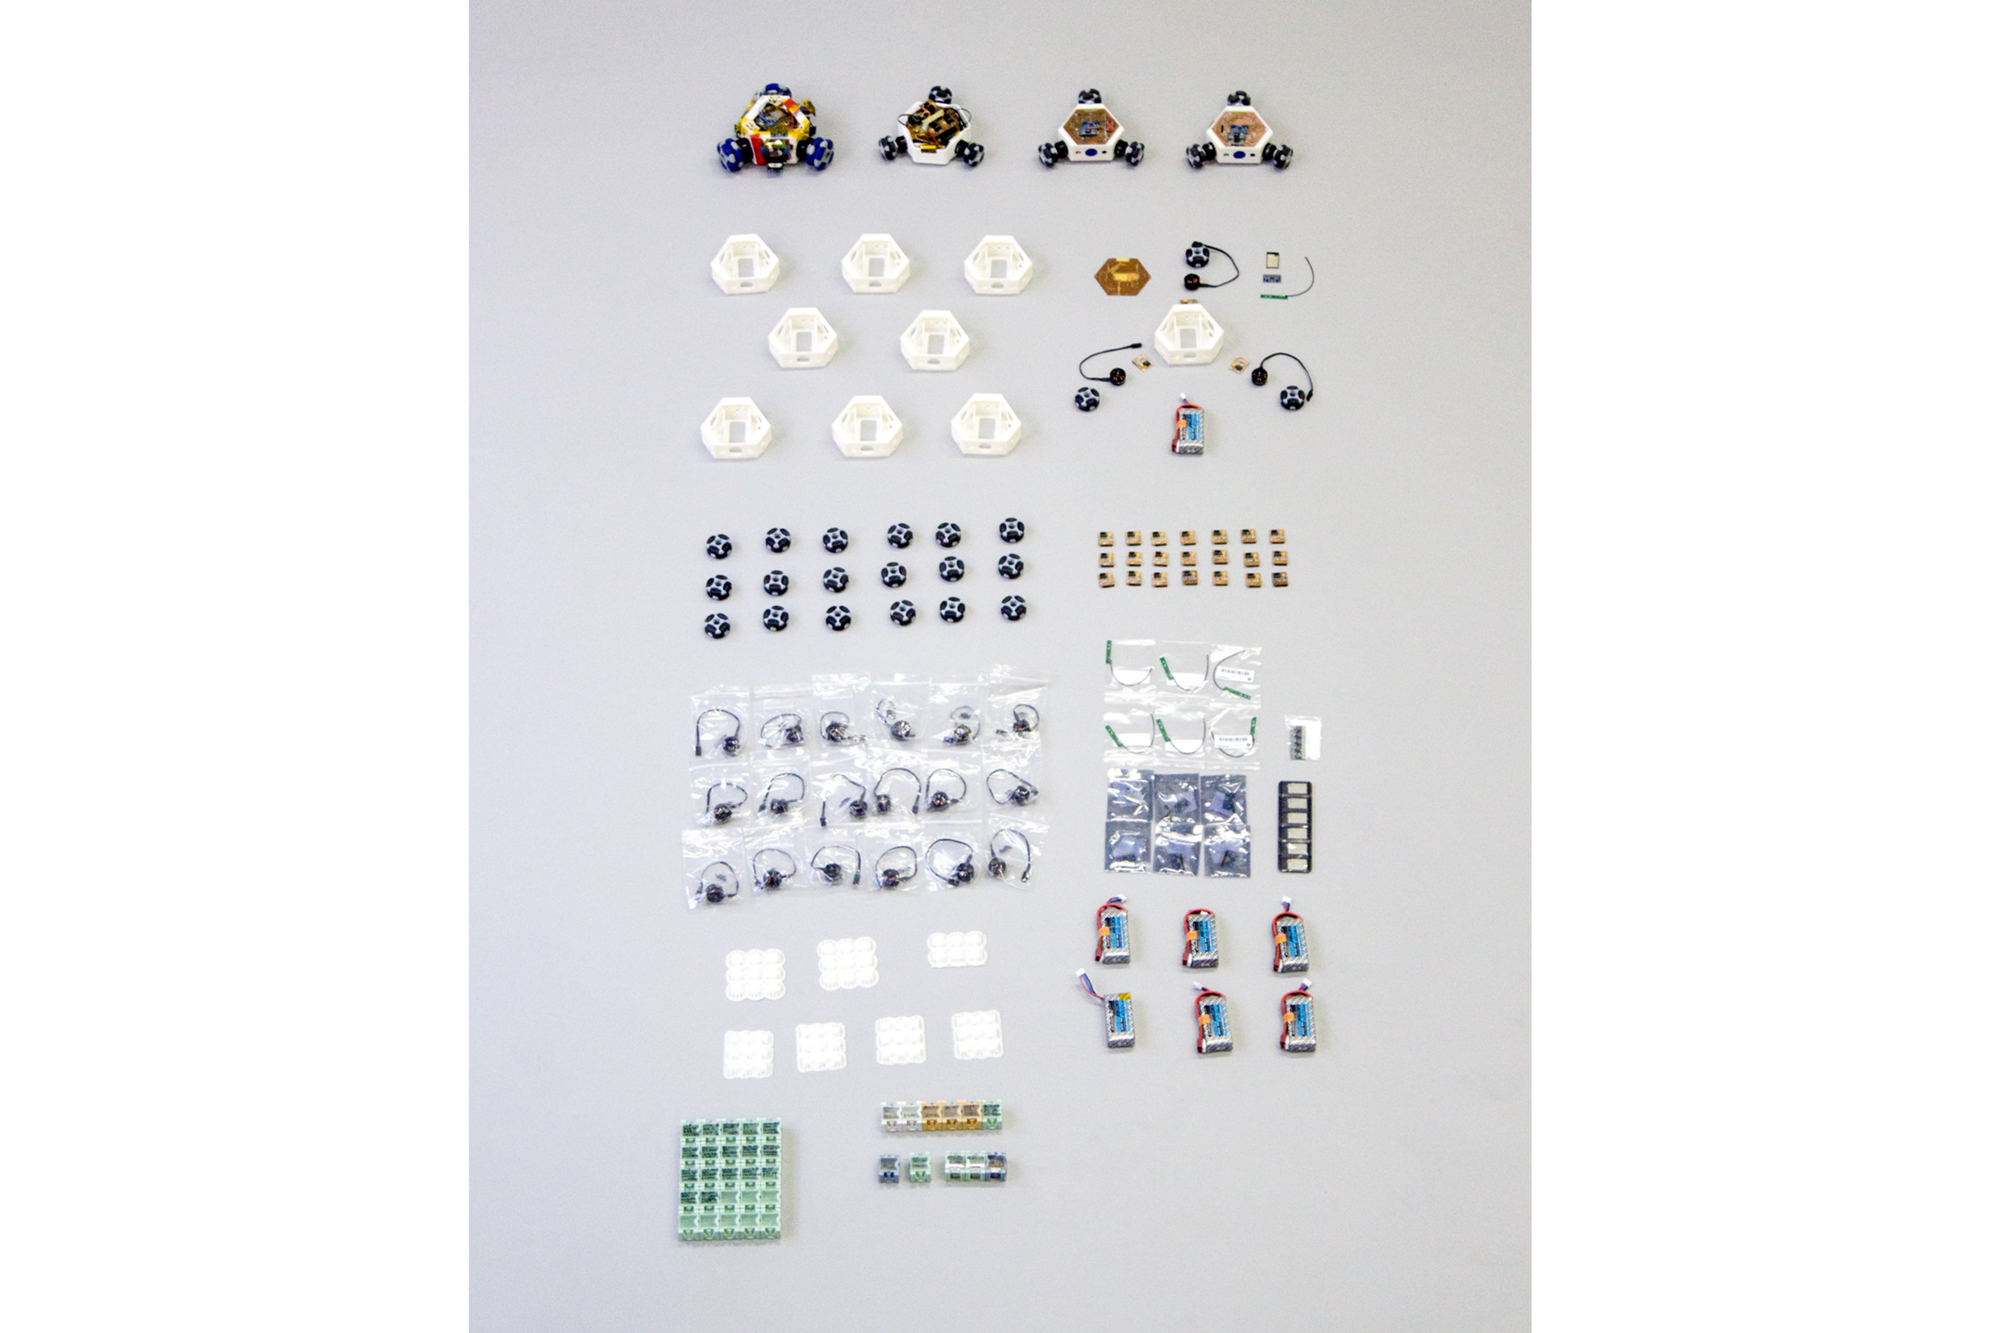 parts_spread_on_floor_0000_Layer 3